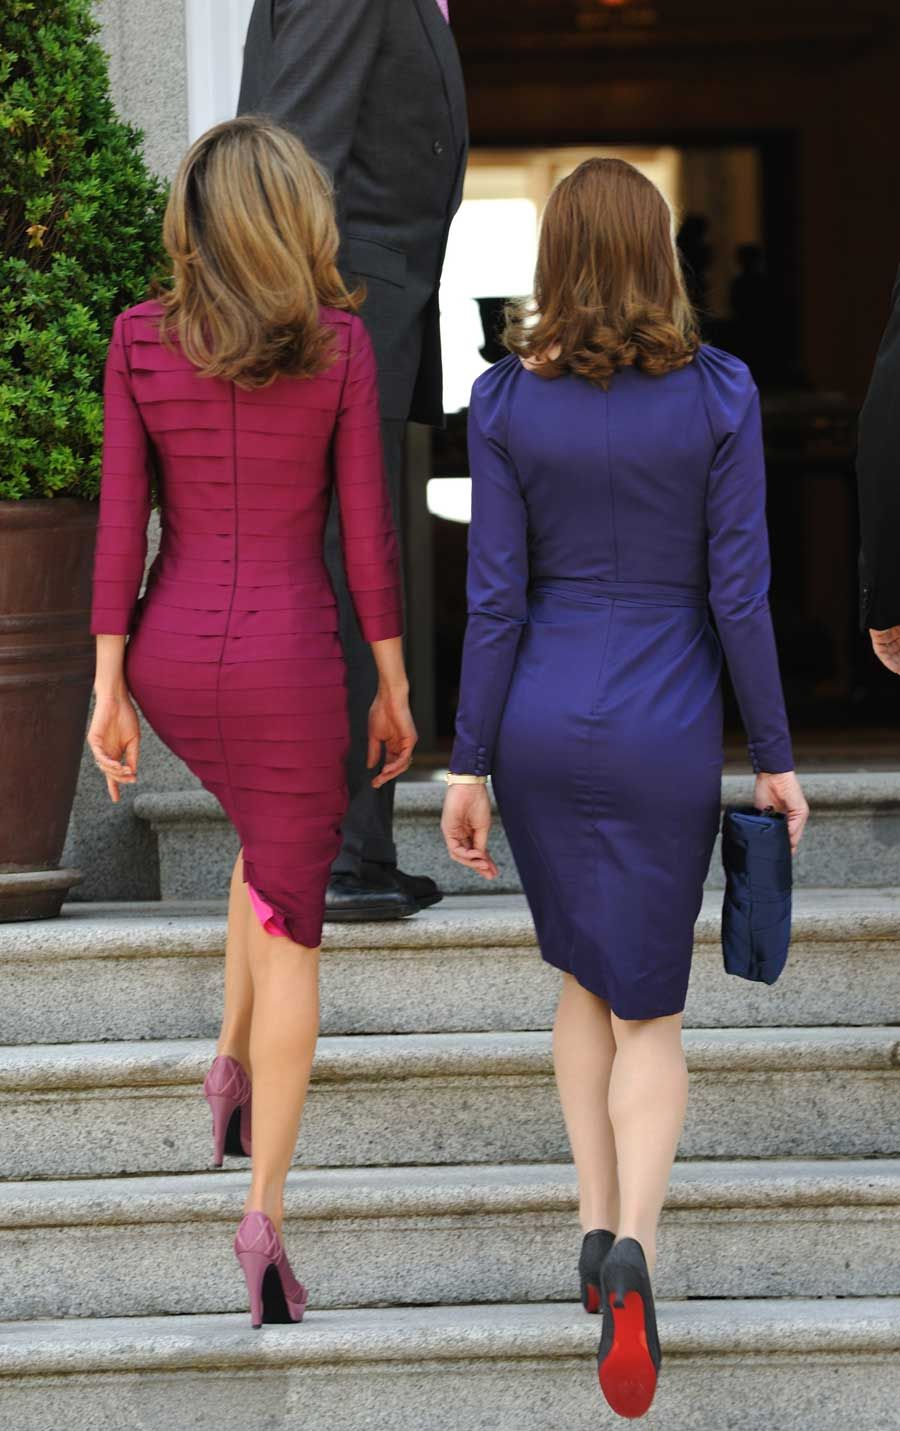 29 Royals ideas | royal family, princess kate, prince william and kate